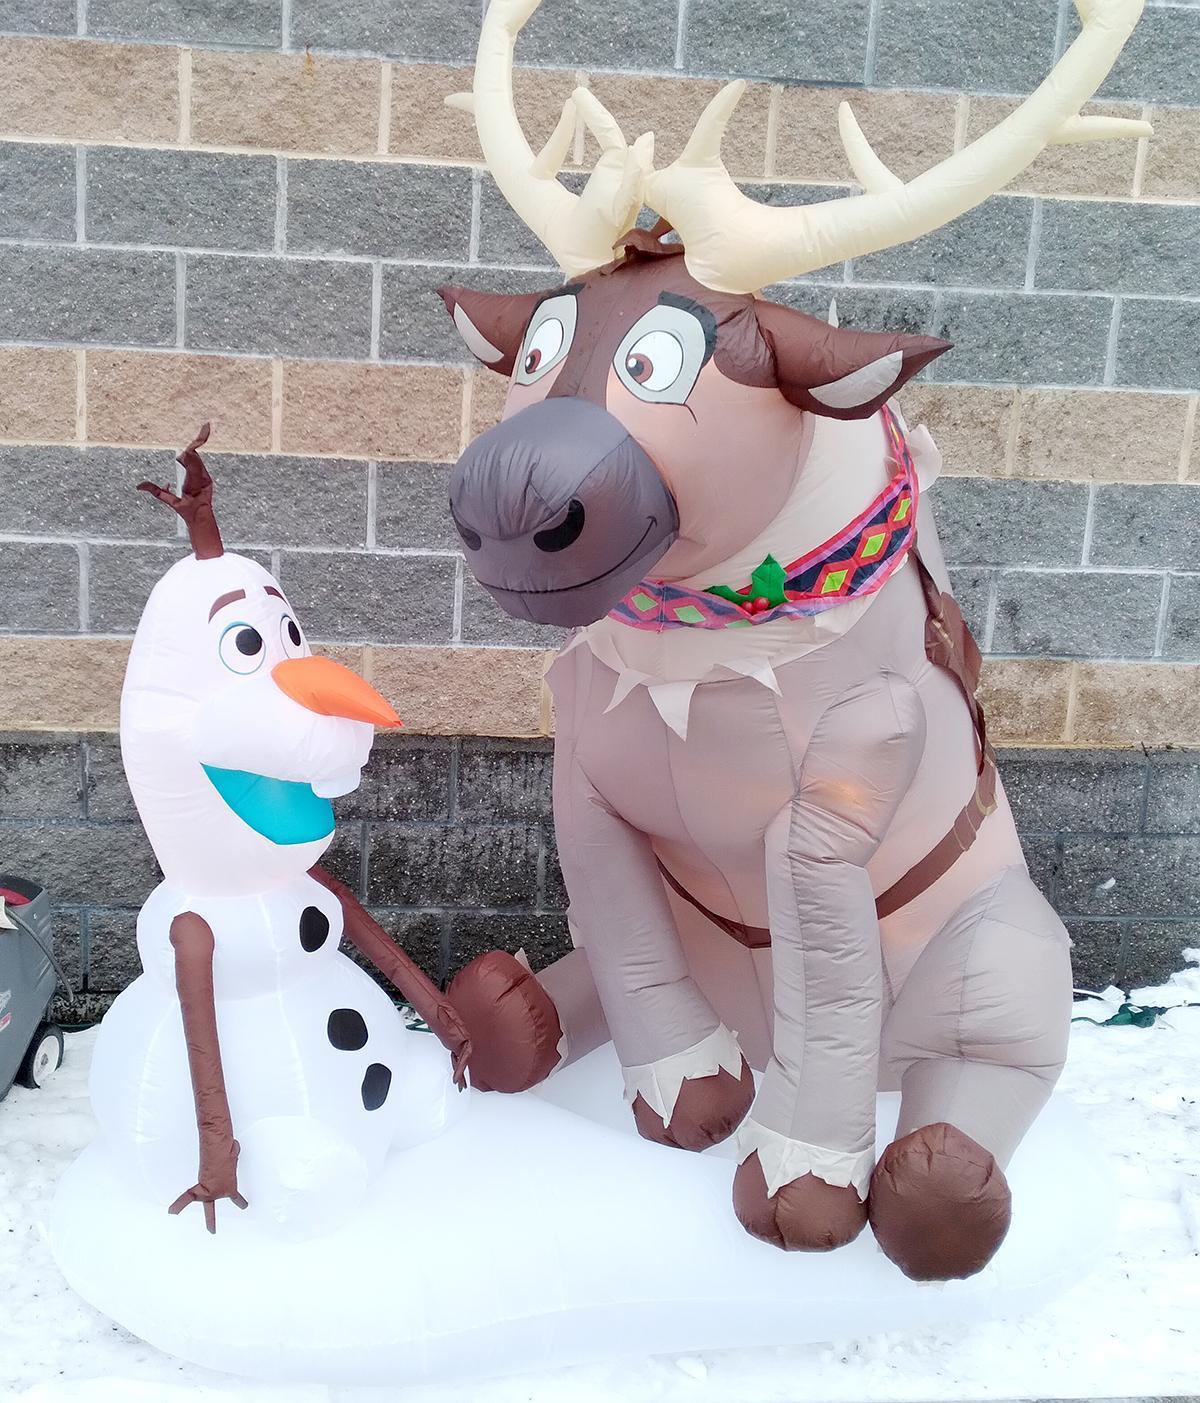 Inflatable Christmas characters